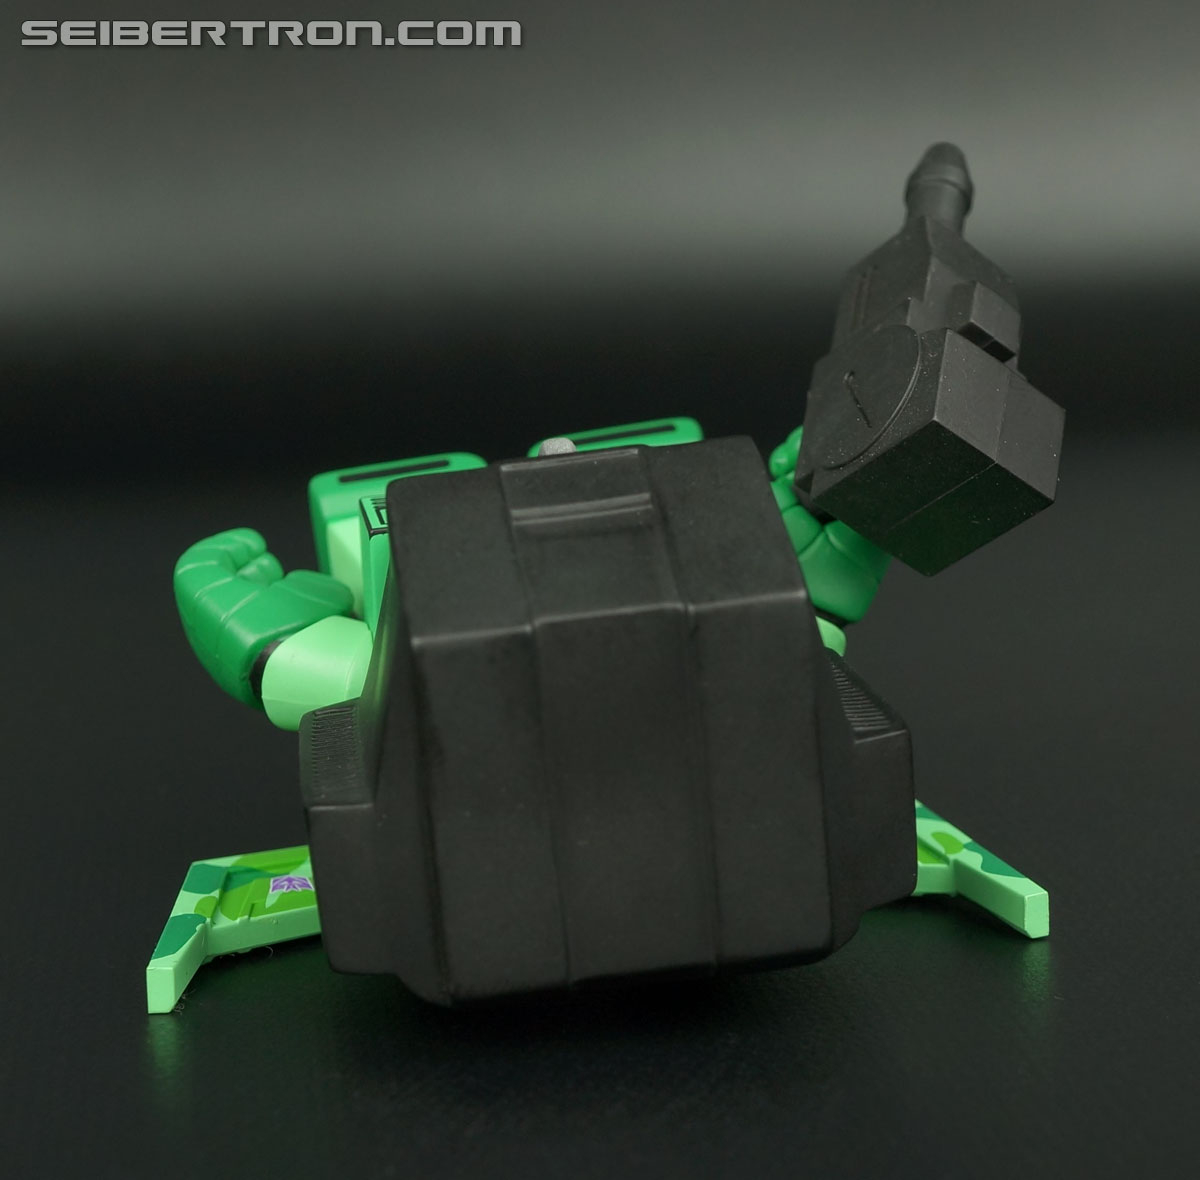 Transformers Loyal Subjects Rainmaker (Green) (Acid Storm) (Image #27 of 40)